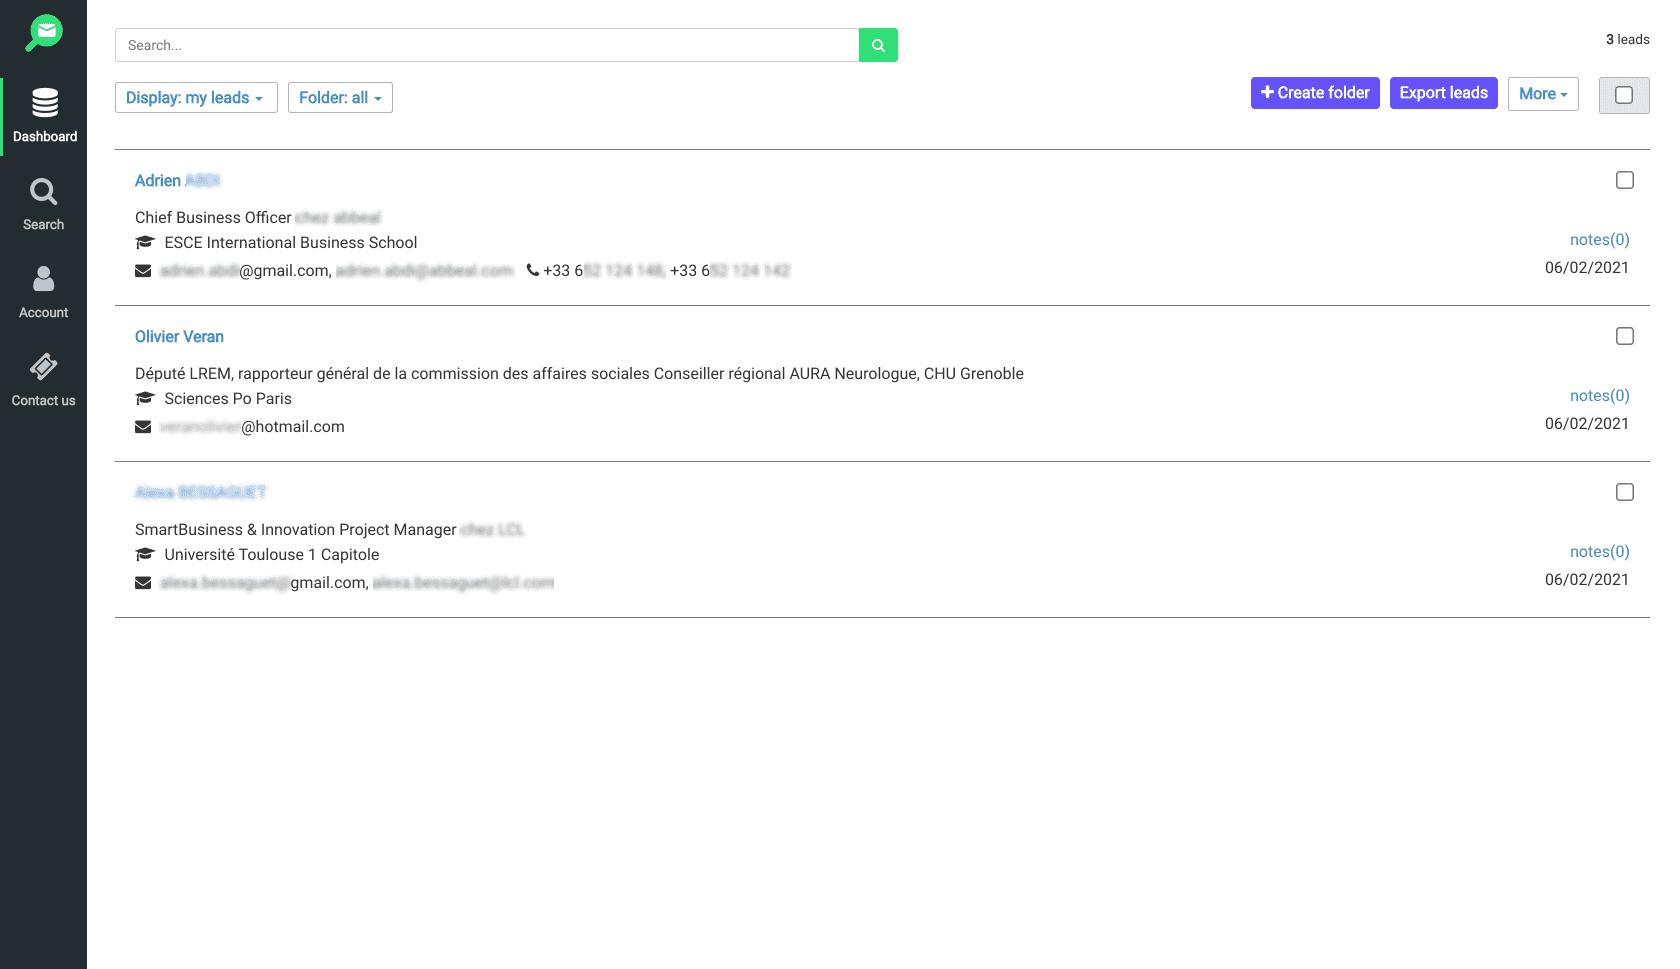 Top Meilleur email finder : ContactOut